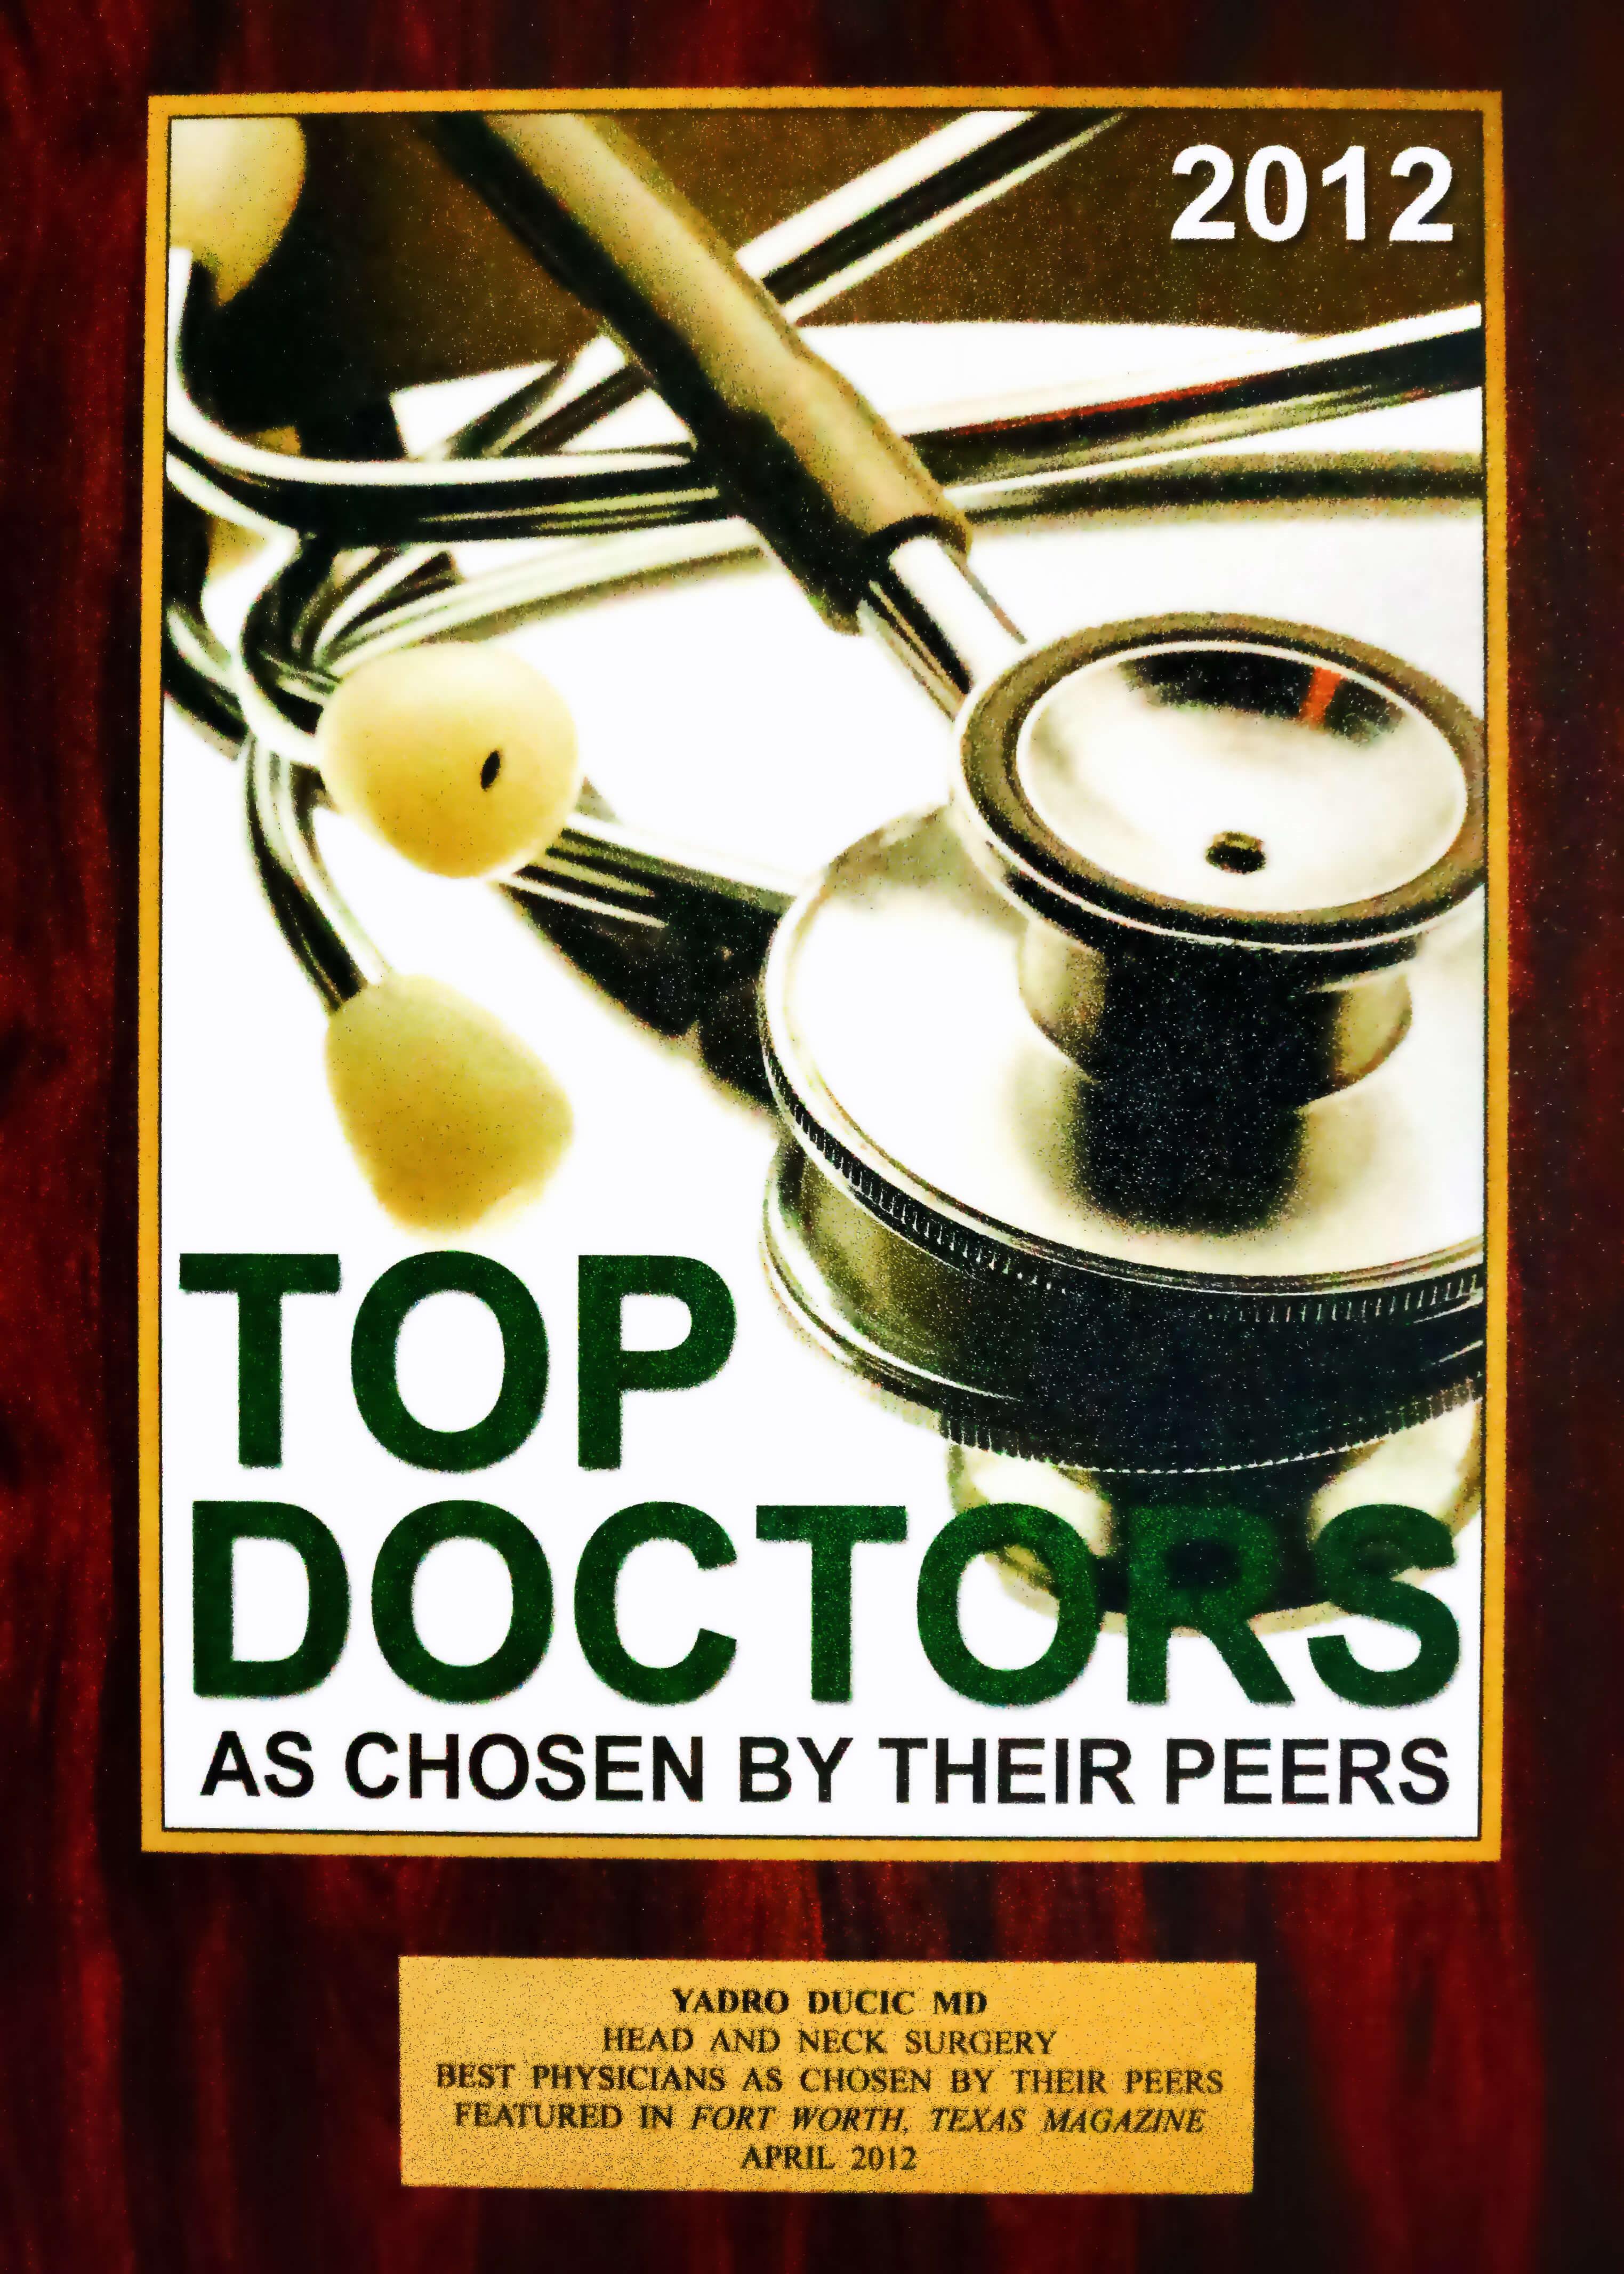 Dr Yadro Ducic Otolaryngologist